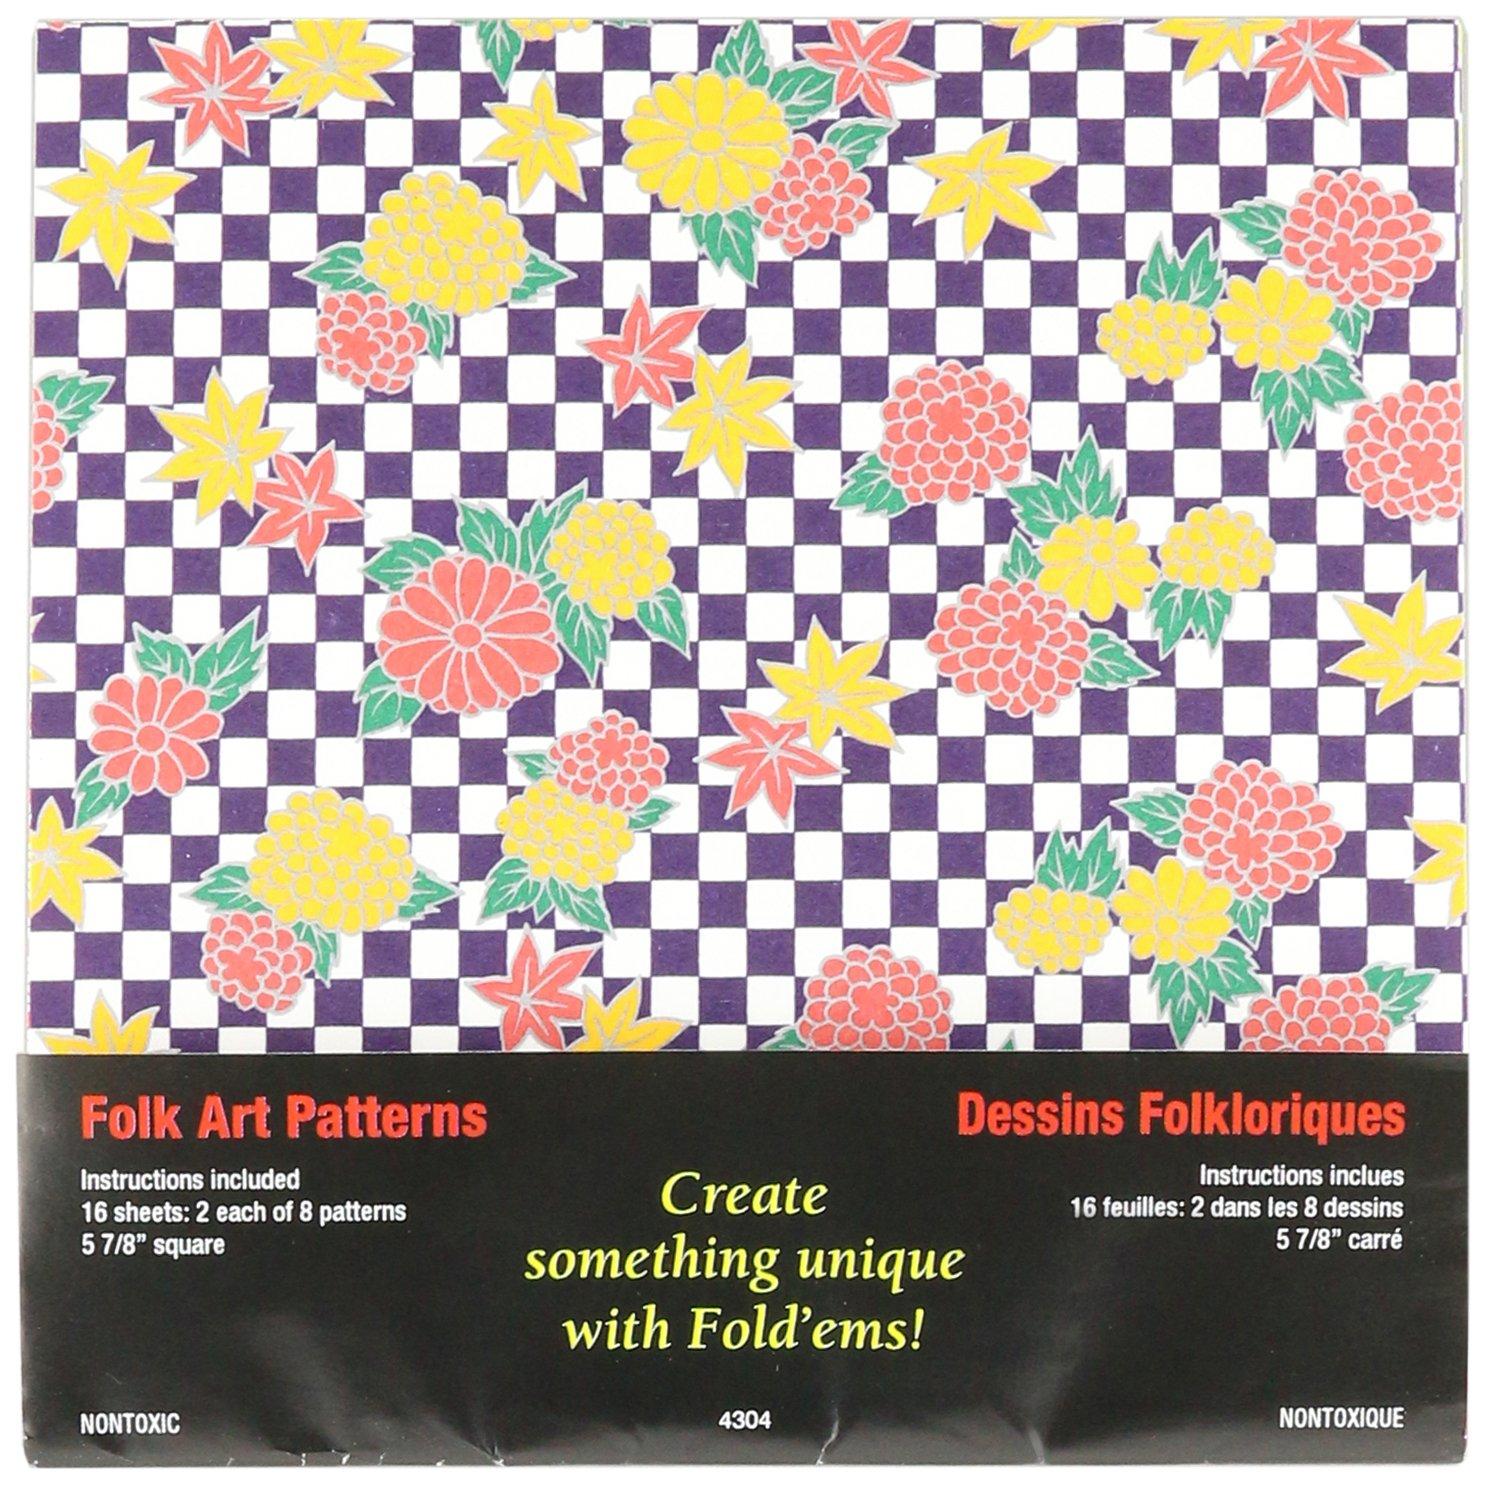 Piegare ' Ems Origami carta 5, 875 16/Pkg-Folk Art 875 16/Pkg-Folk Art Yasutomo 301279